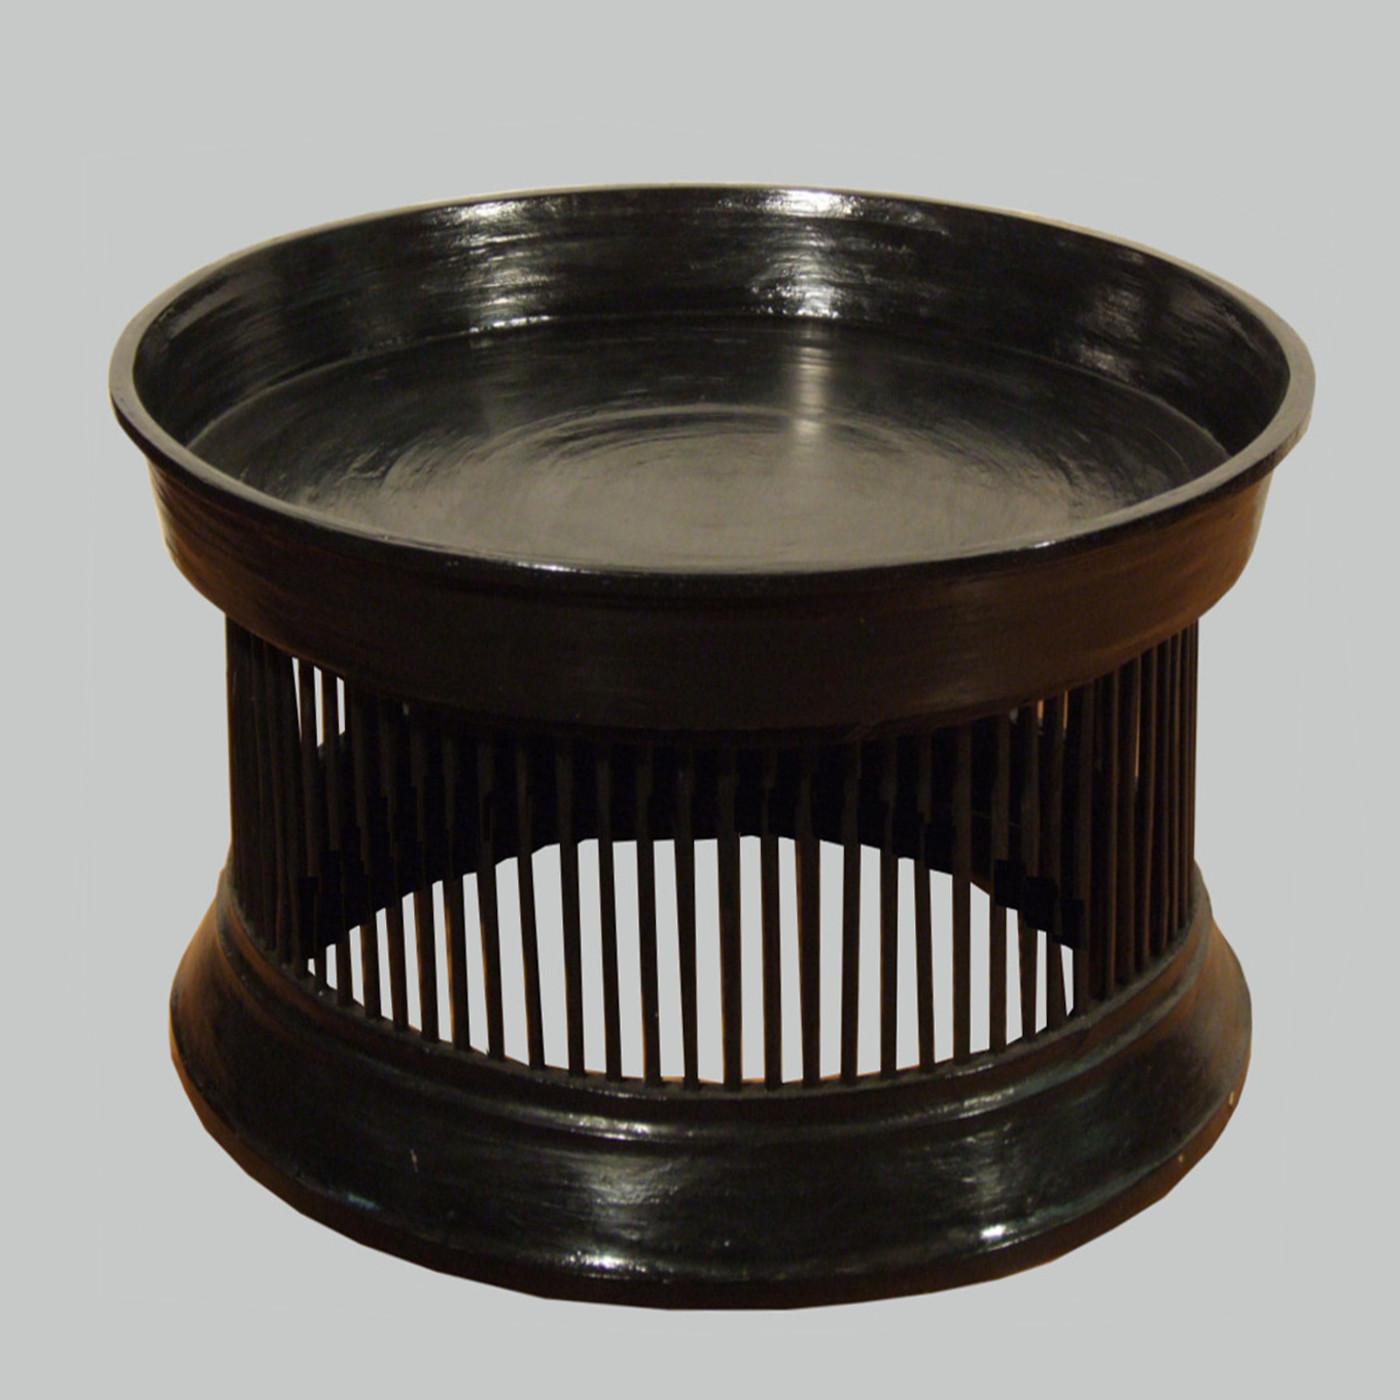 burmesischer tempeltisch schwarz d90 h60 batavia. Black Bedroom Furniture Sets. Home Design Ideas